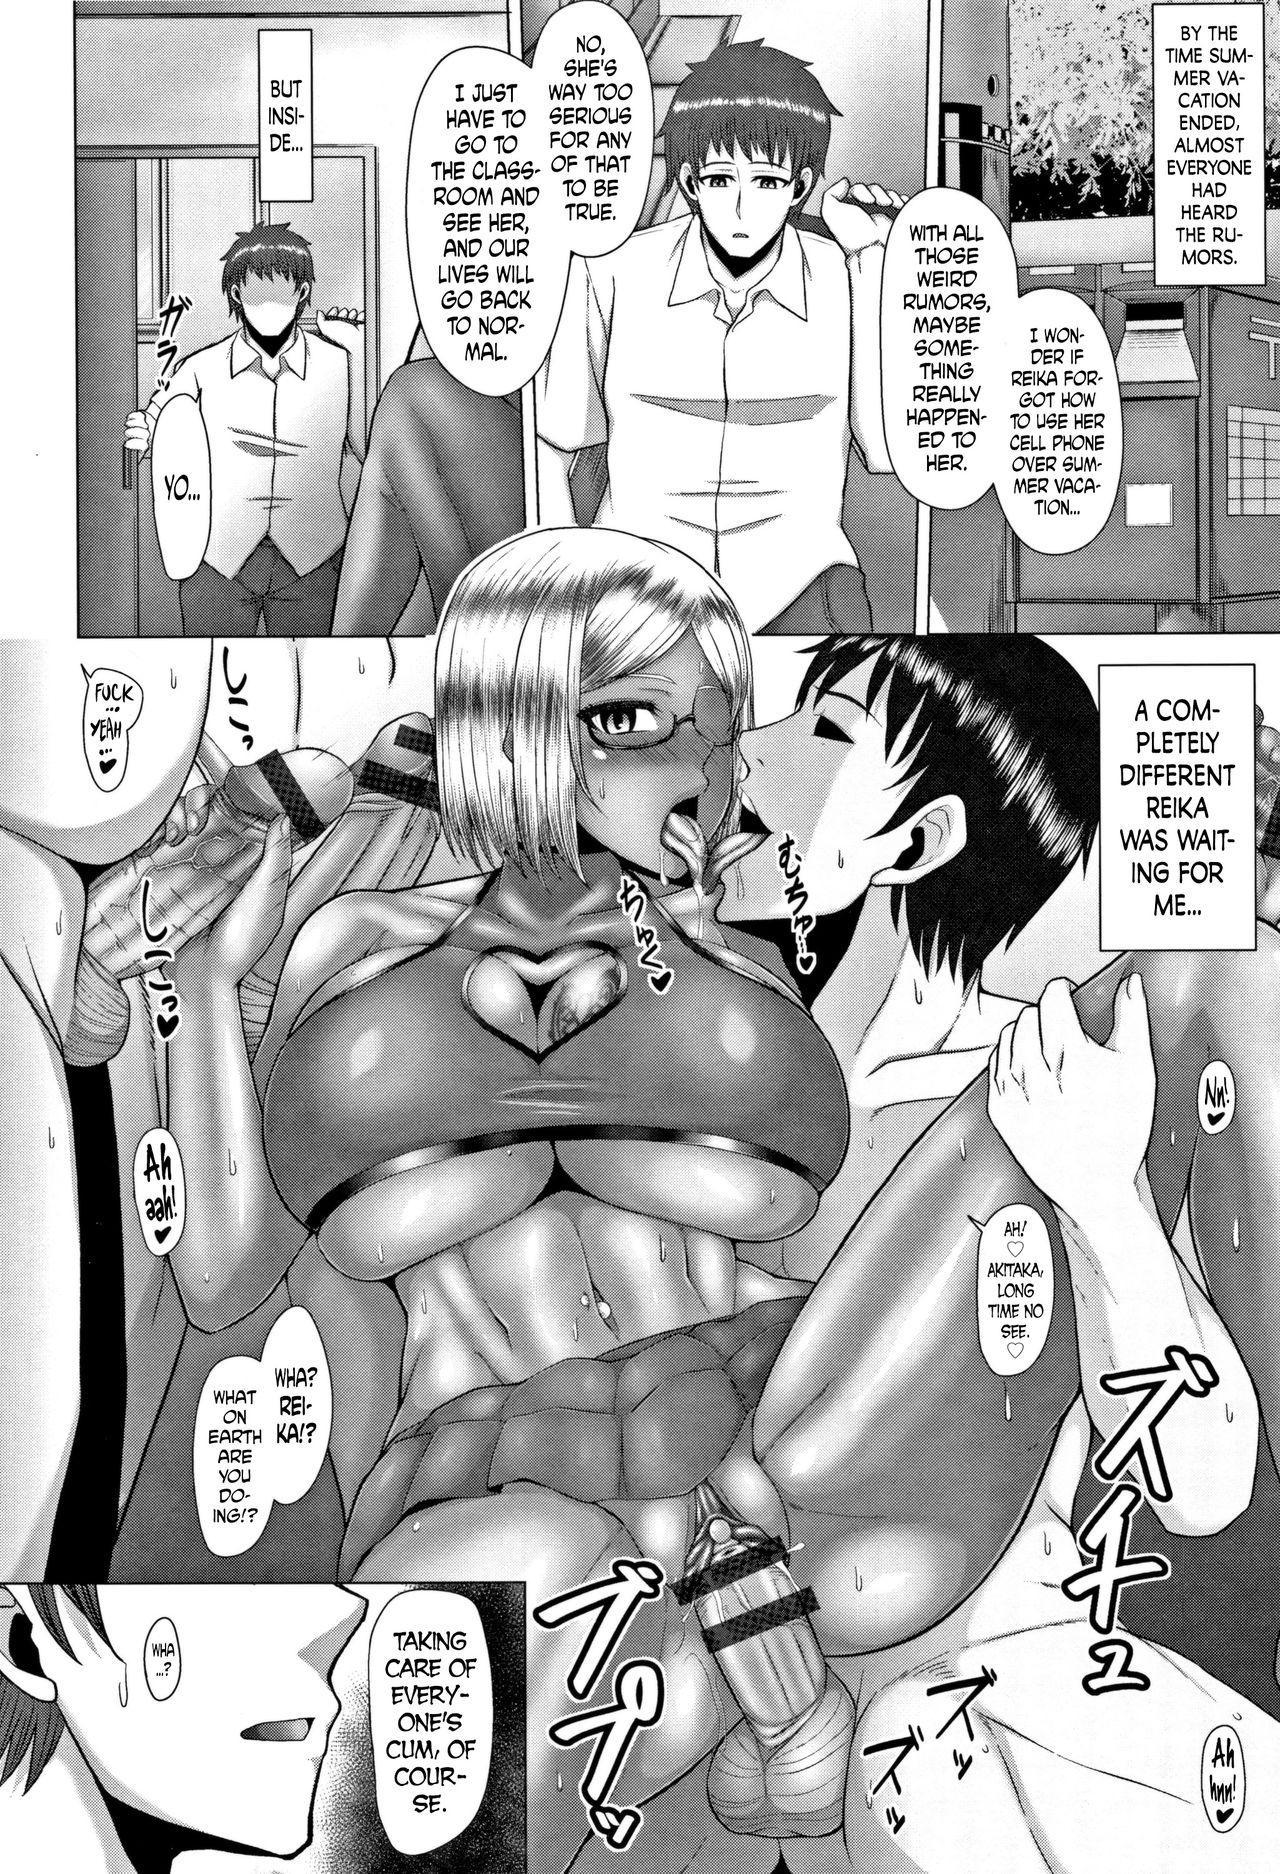 [Inoue Nanaki] Joushiki Daha! Kuro Gal Bitch-ka Seikatsu Ch. 1-3, 5-8 [English] [Dark Mac + N04h] 135